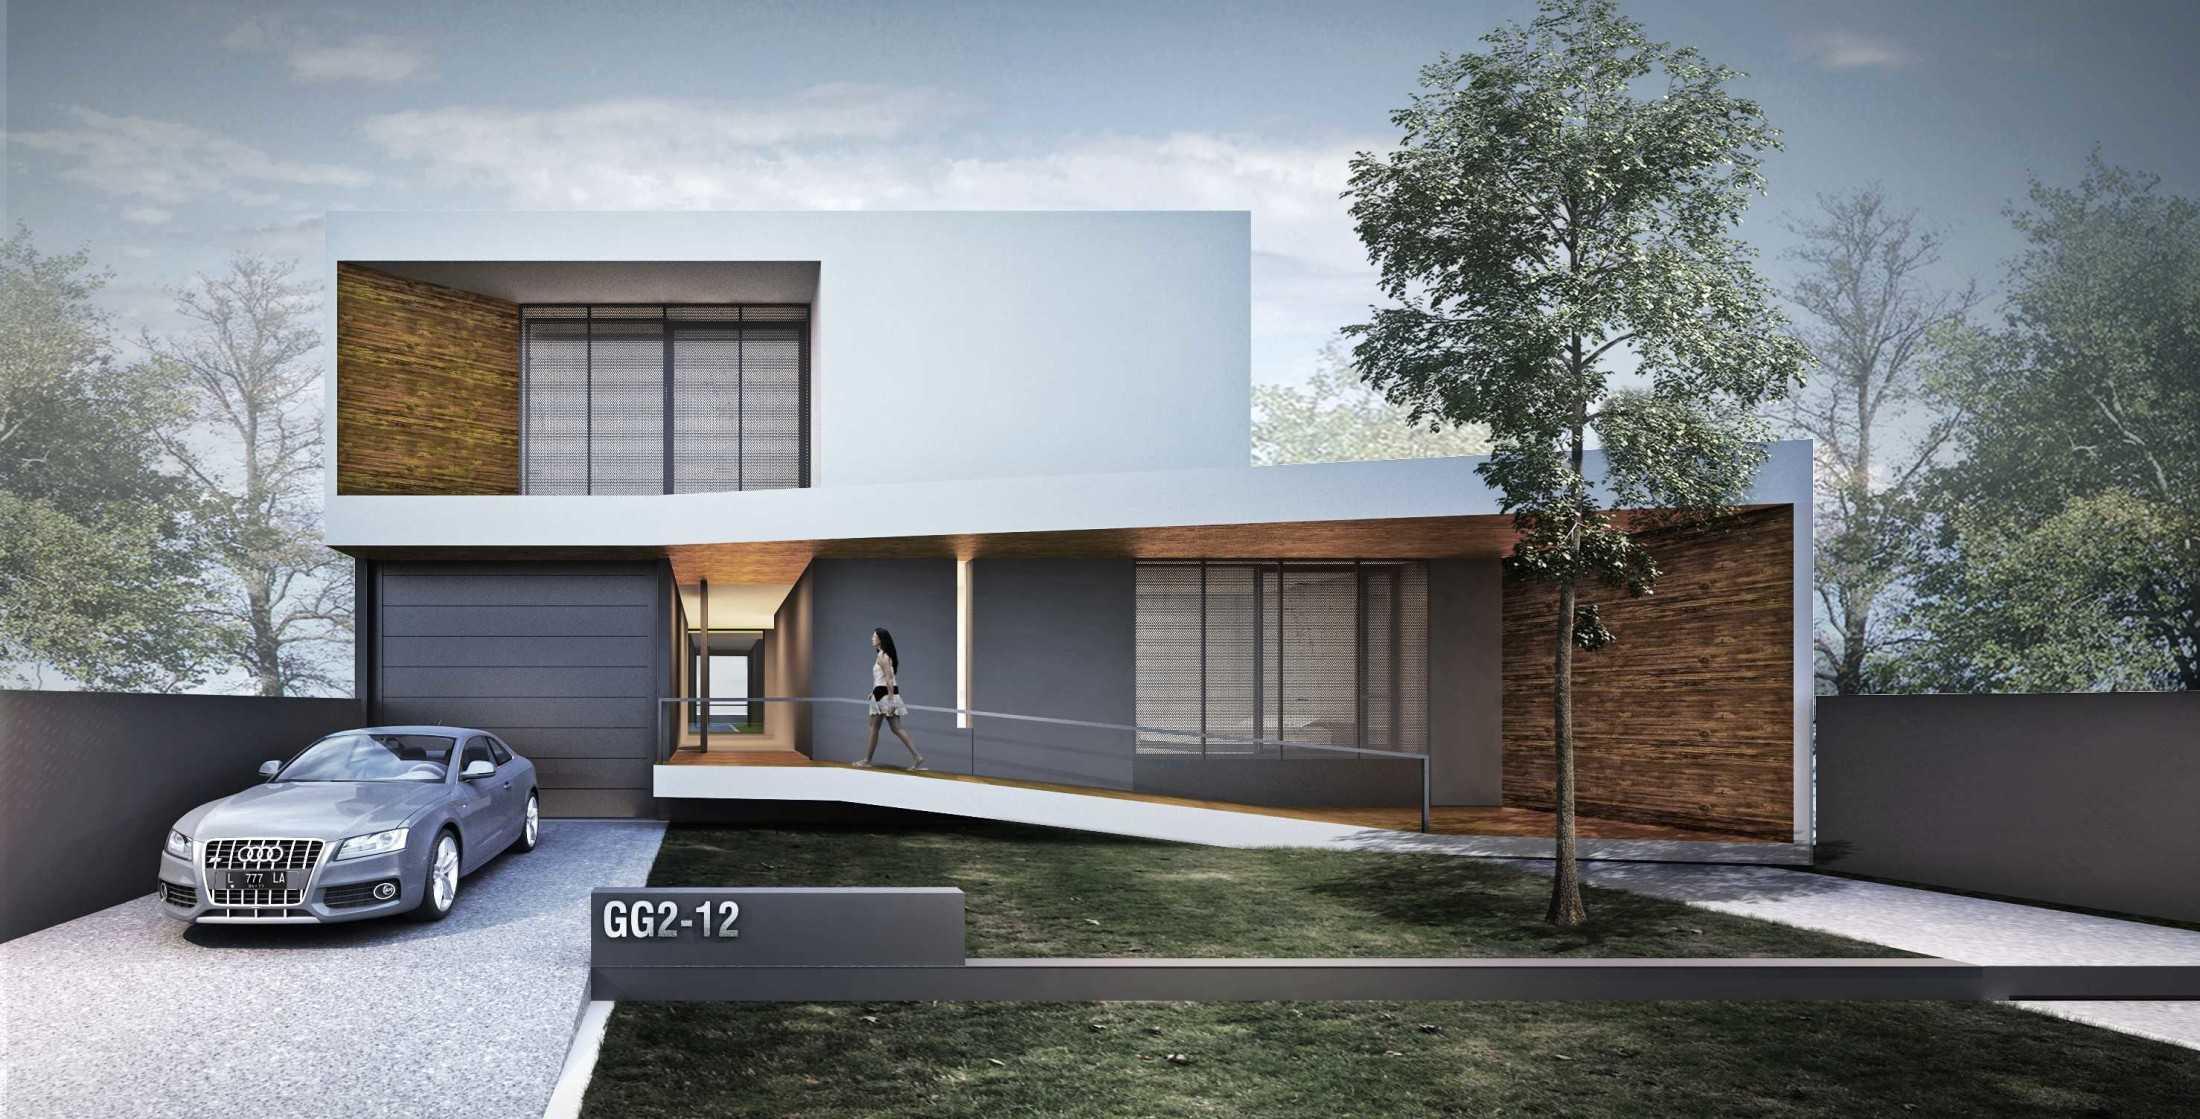 Ivan Priatman Architecture Jv House Surabaya, Kota Sby, Jawa Timur, Indonesia Surabaya, Kota Sby, Jawa Timur, Indonesia Ivan-Priatman-Architecture-Jv-House  59106